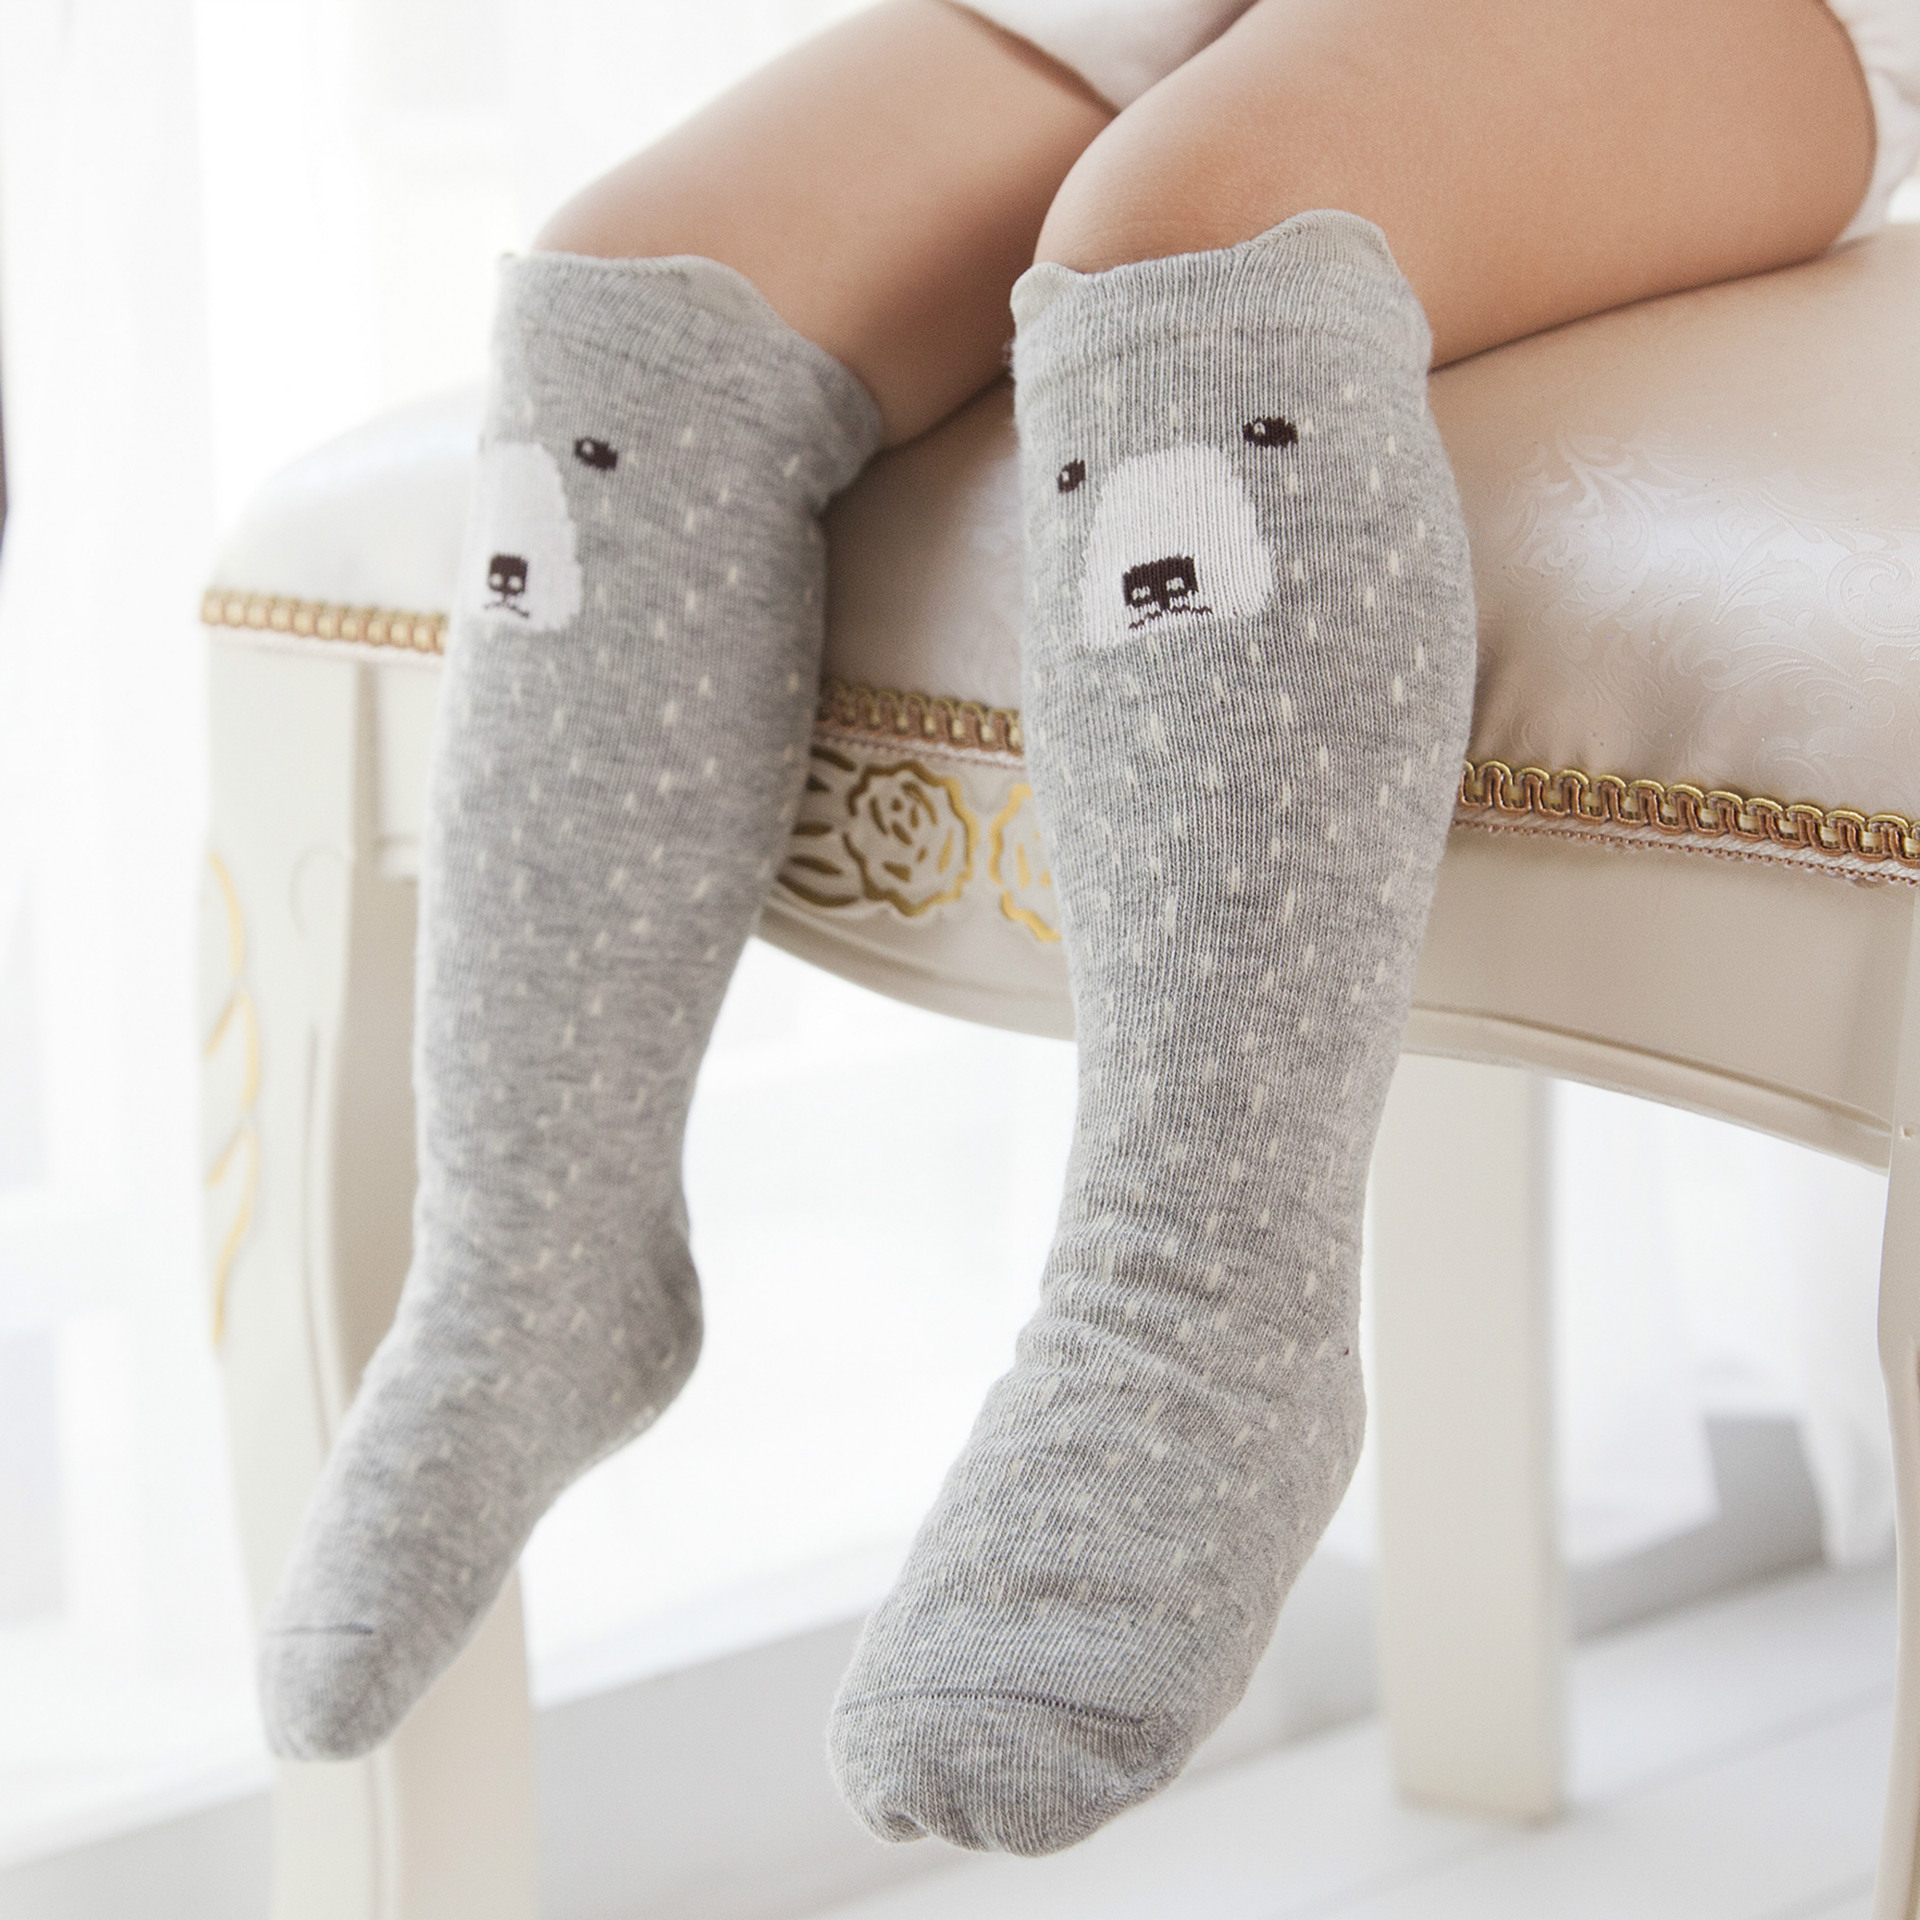 4 Pair/lot Baby Boys Girls Animal Sock Children Socks Baby Boy Girls Meias Infantis Bebe Menina Joelho Calcetines Animales Bebe